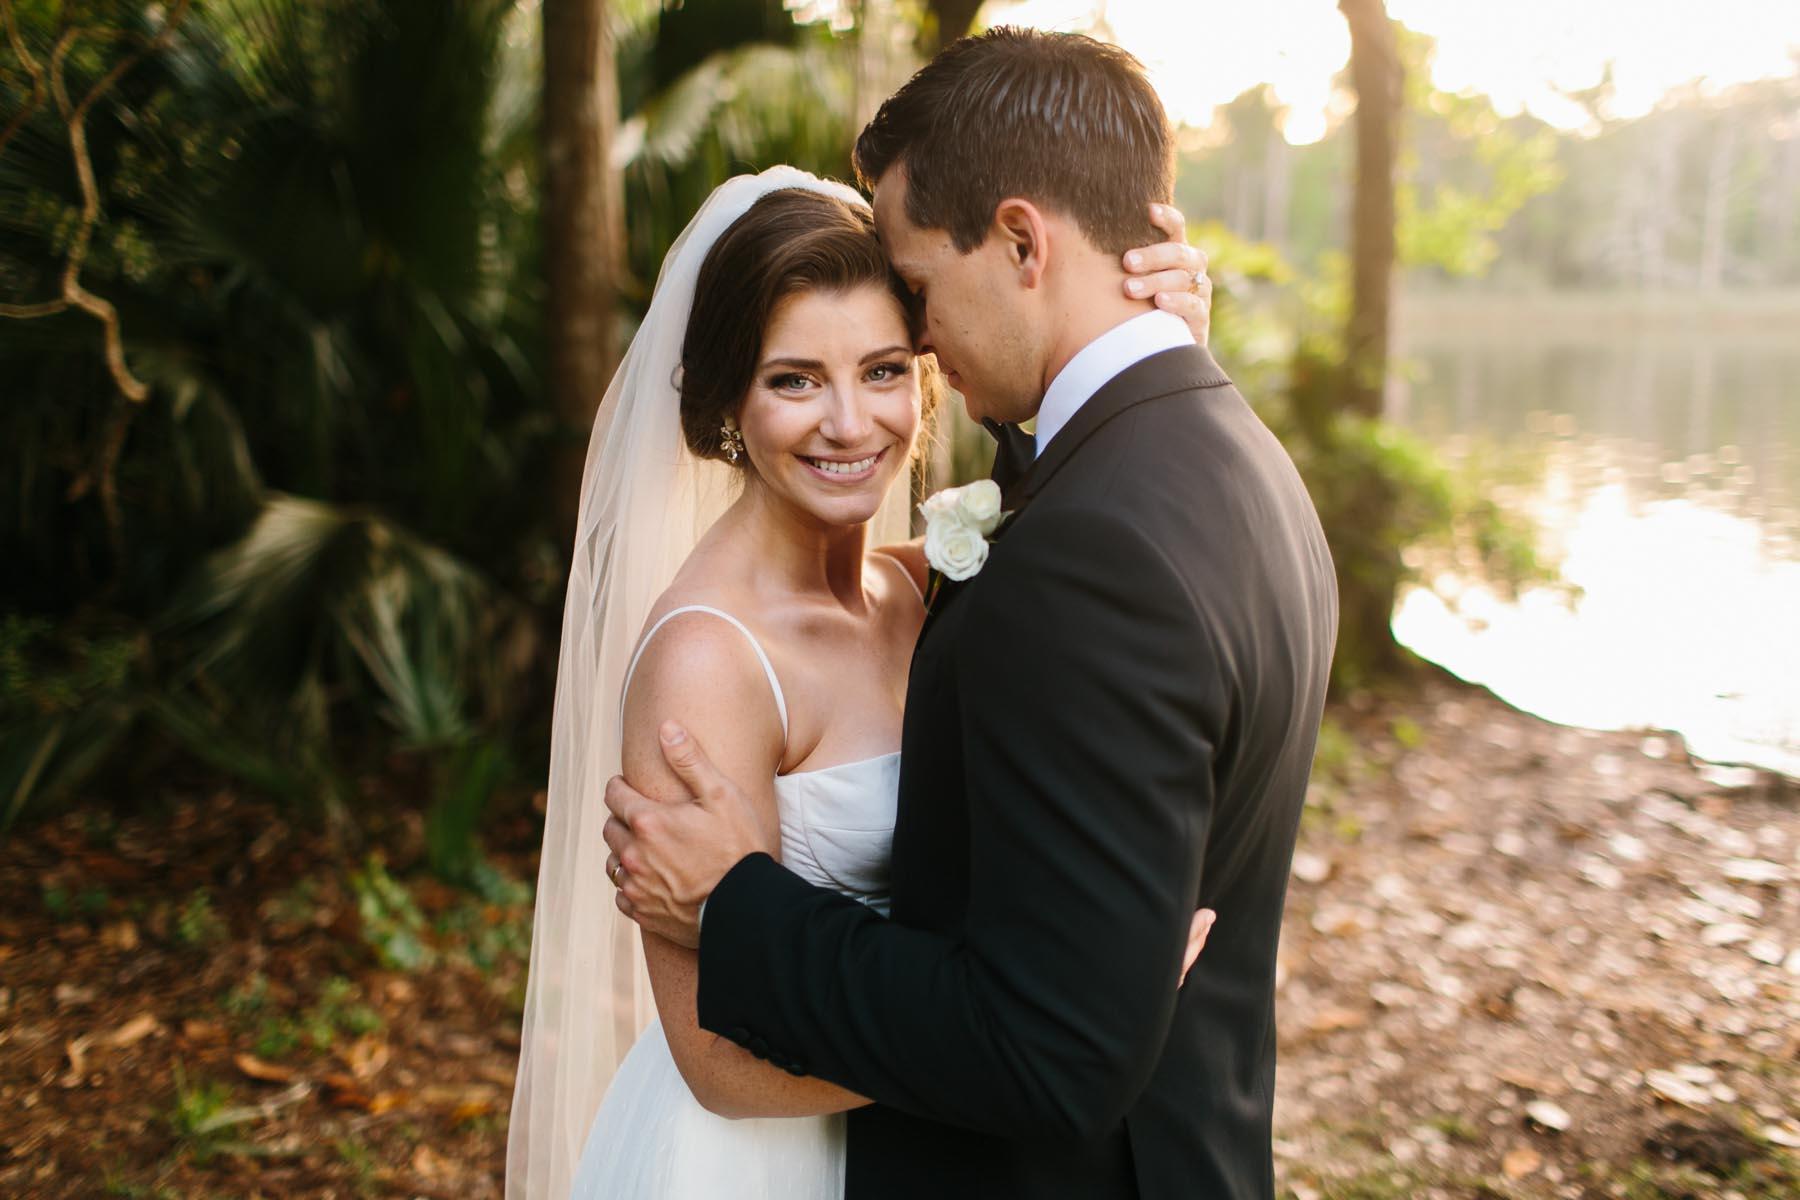 lowry wedding blog eden garden florida wedding-103